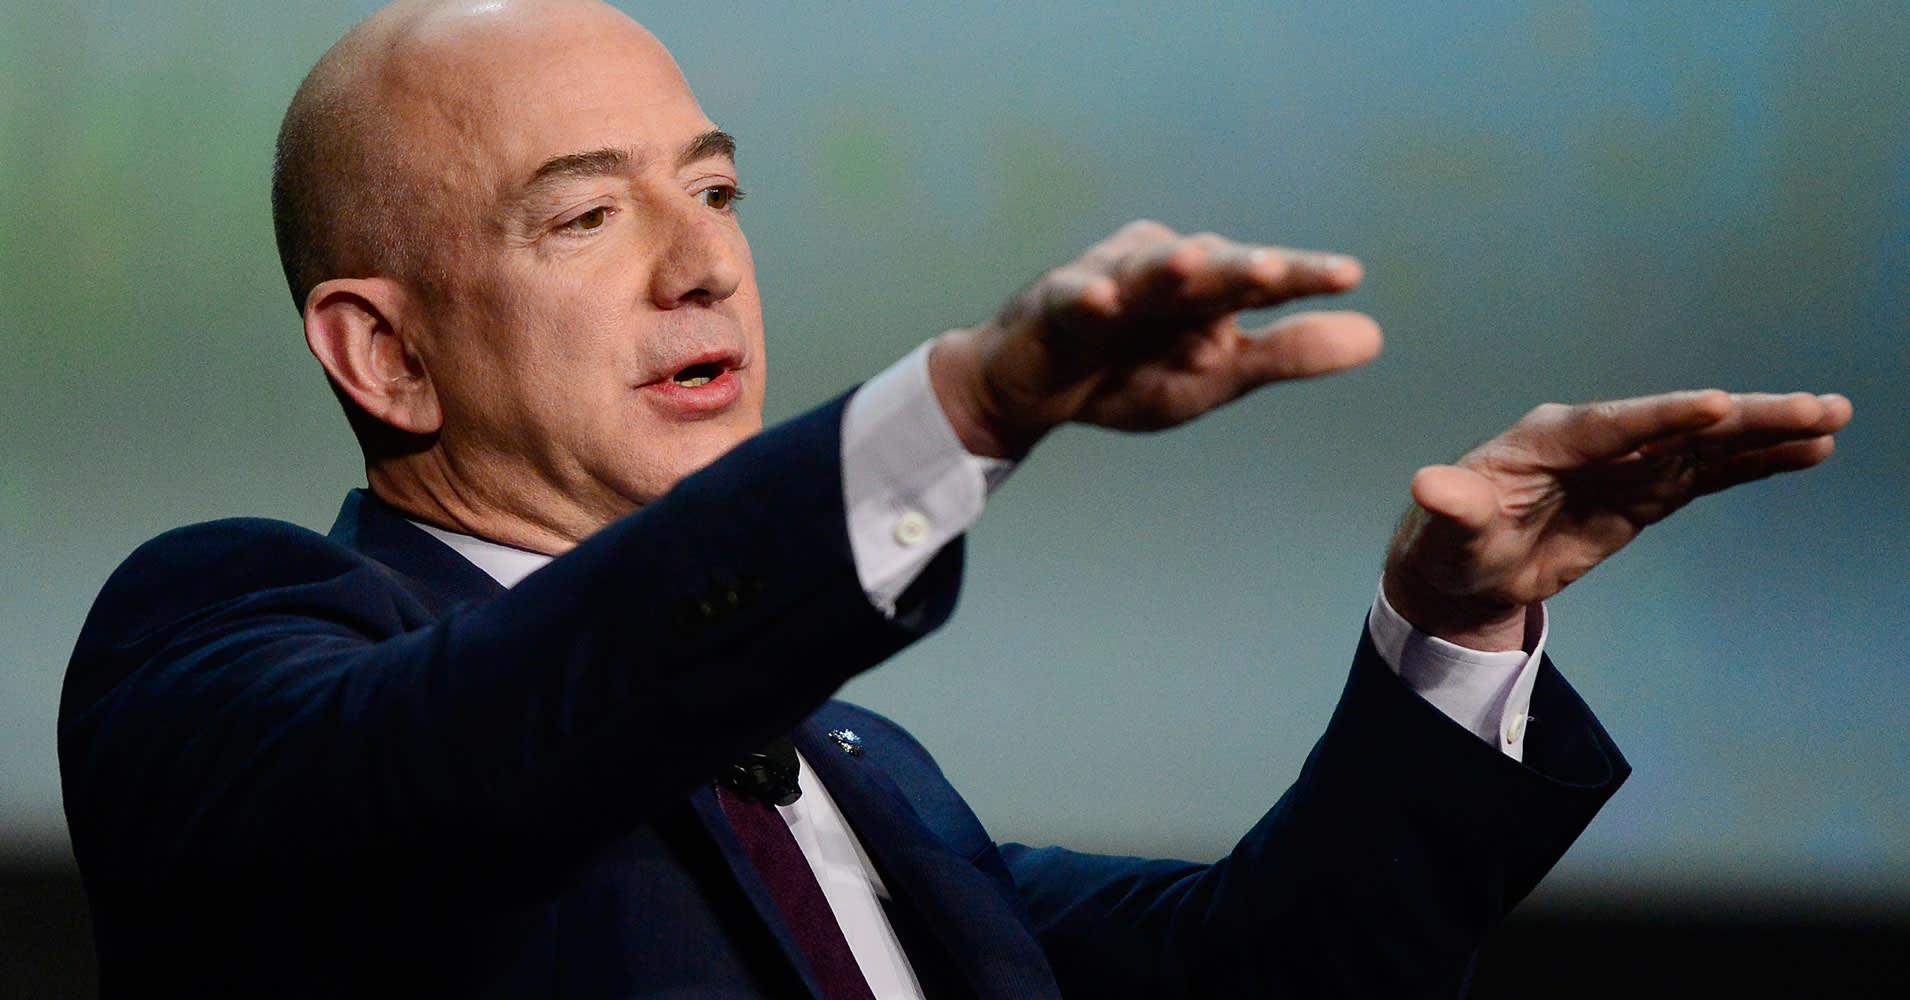 Bezos story is warning to Amazon on succession plan: Jeff Sonnenfeld